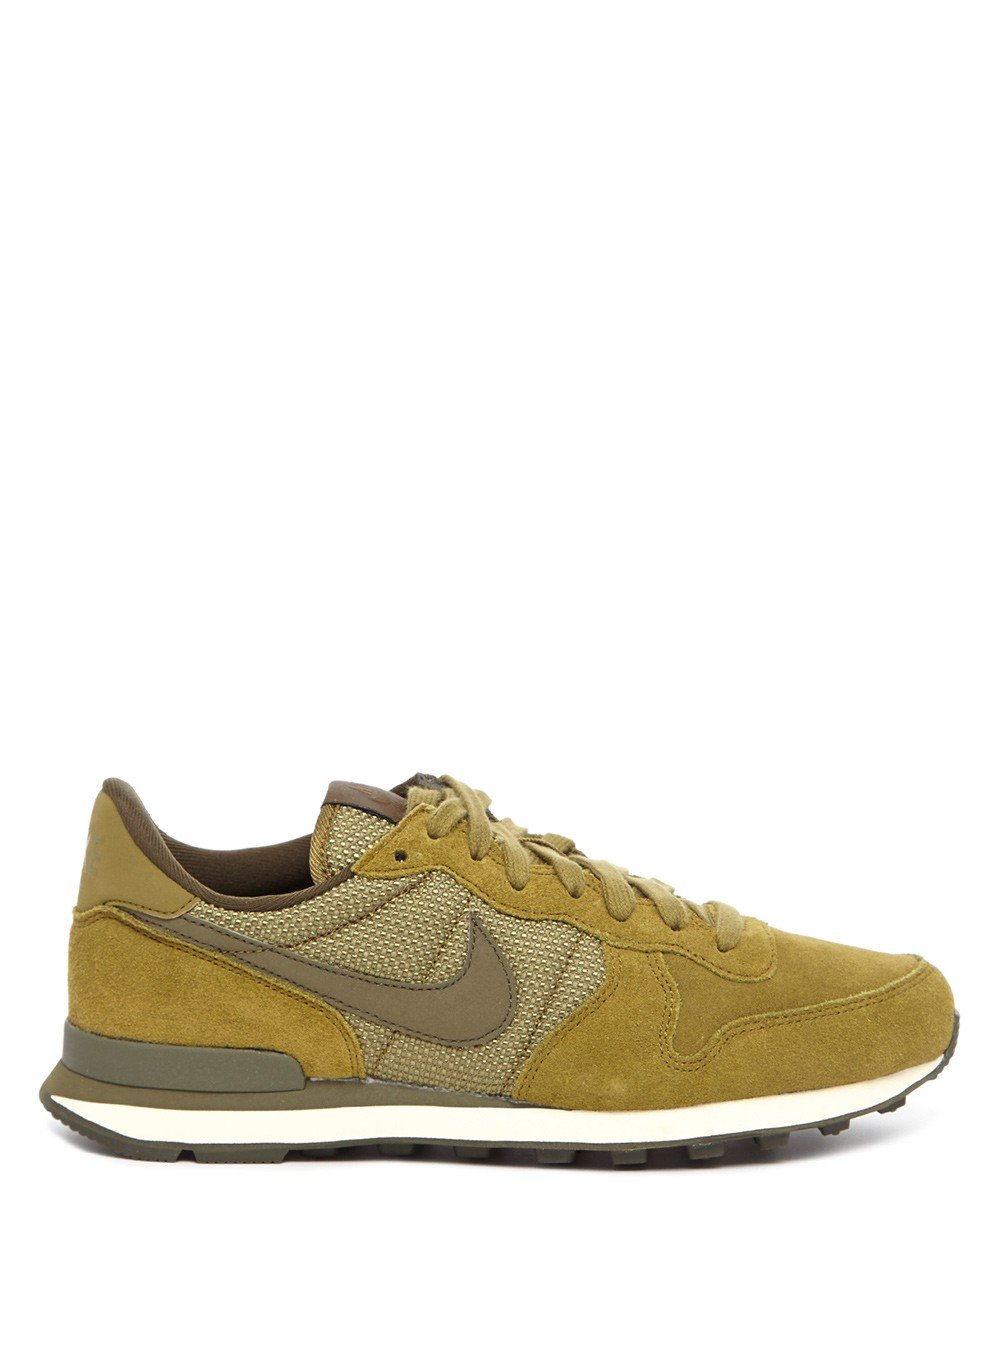 Nike Internationalist PRM, Zapatillas de Running para Hombre 40 EU|Verde (Olive Flak / Dark Loden-cashmere)